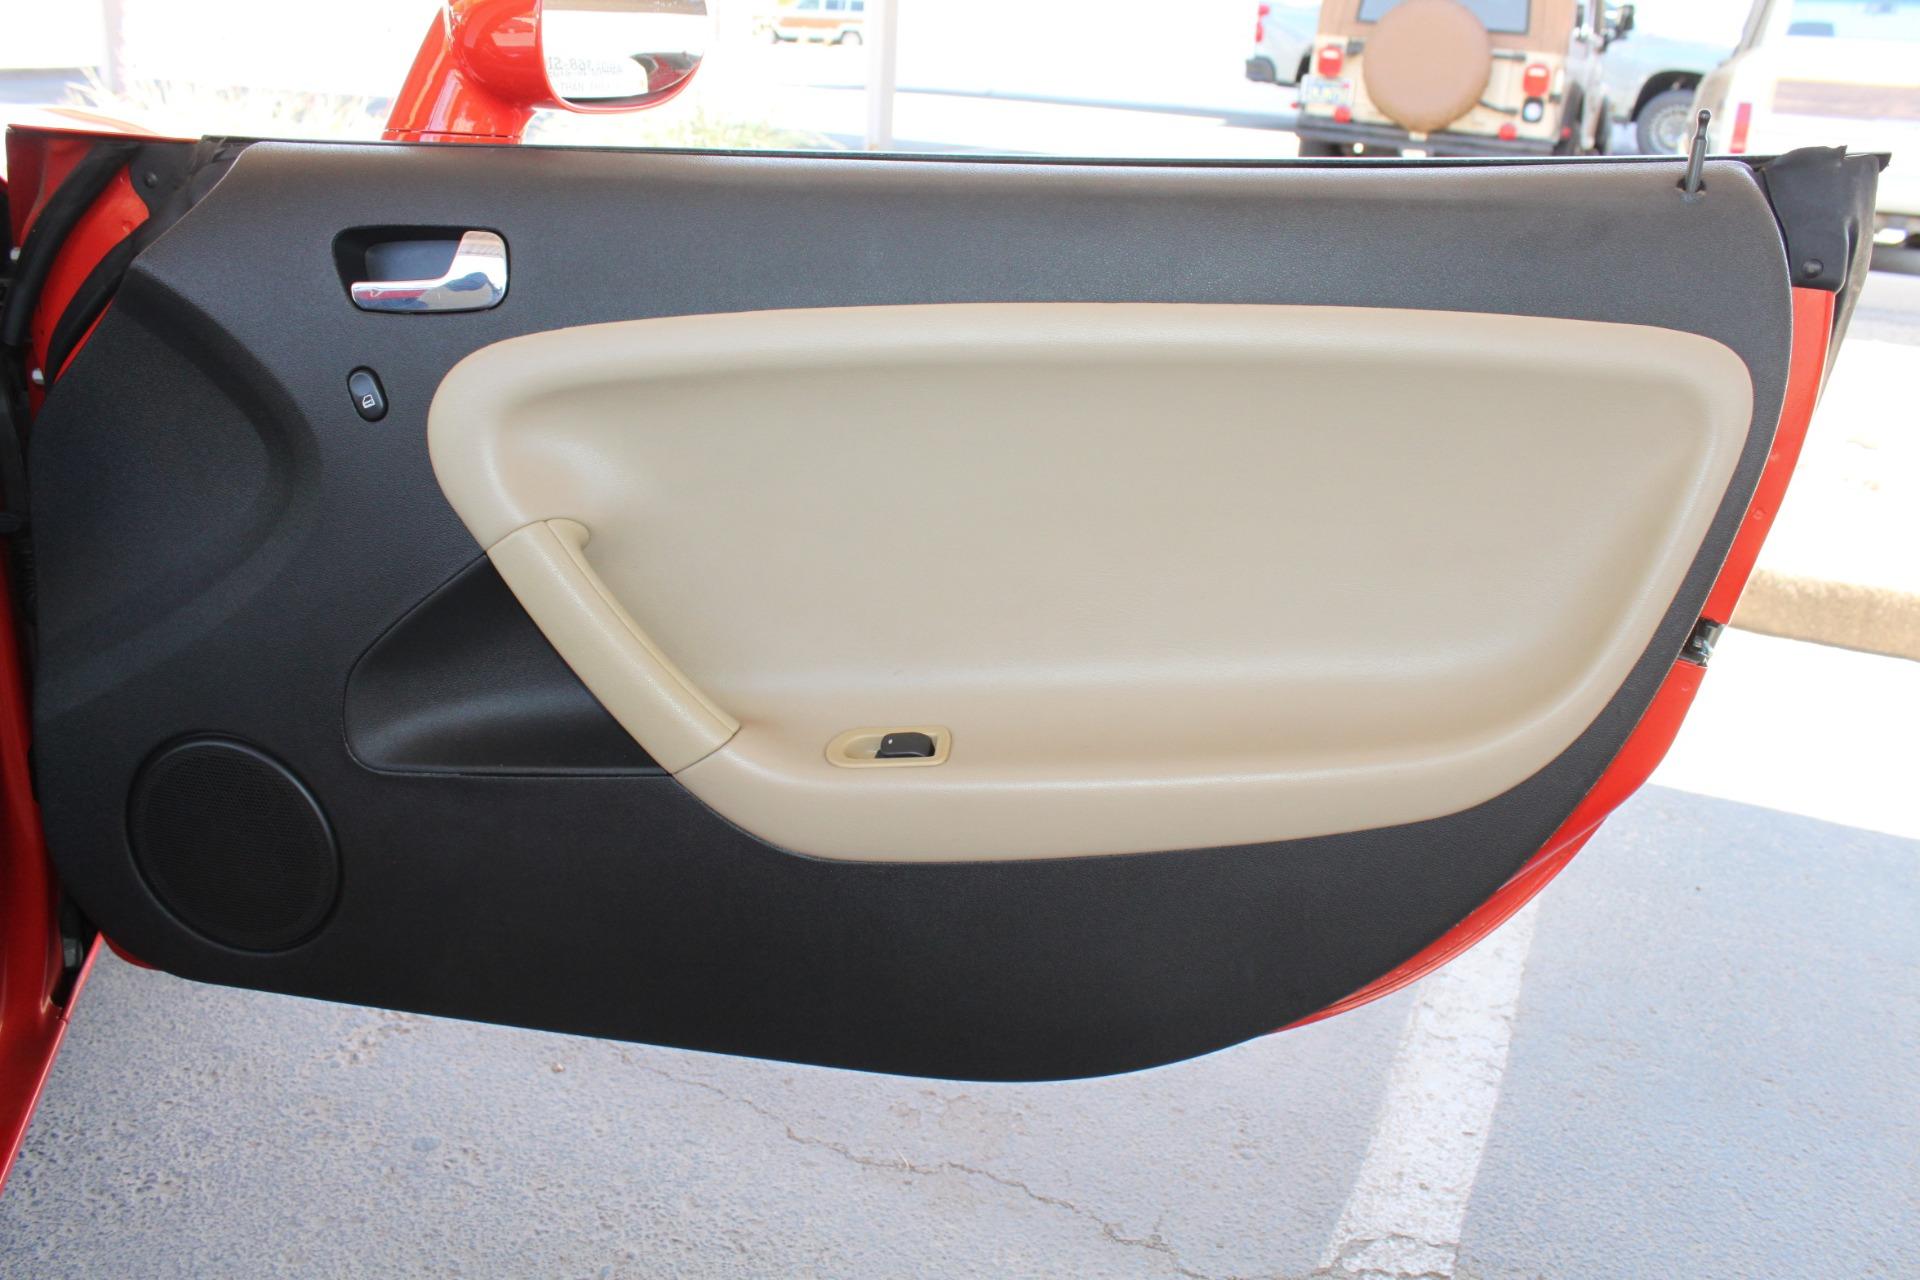 Used-2008-Pontiac-Solstice-Chevelle